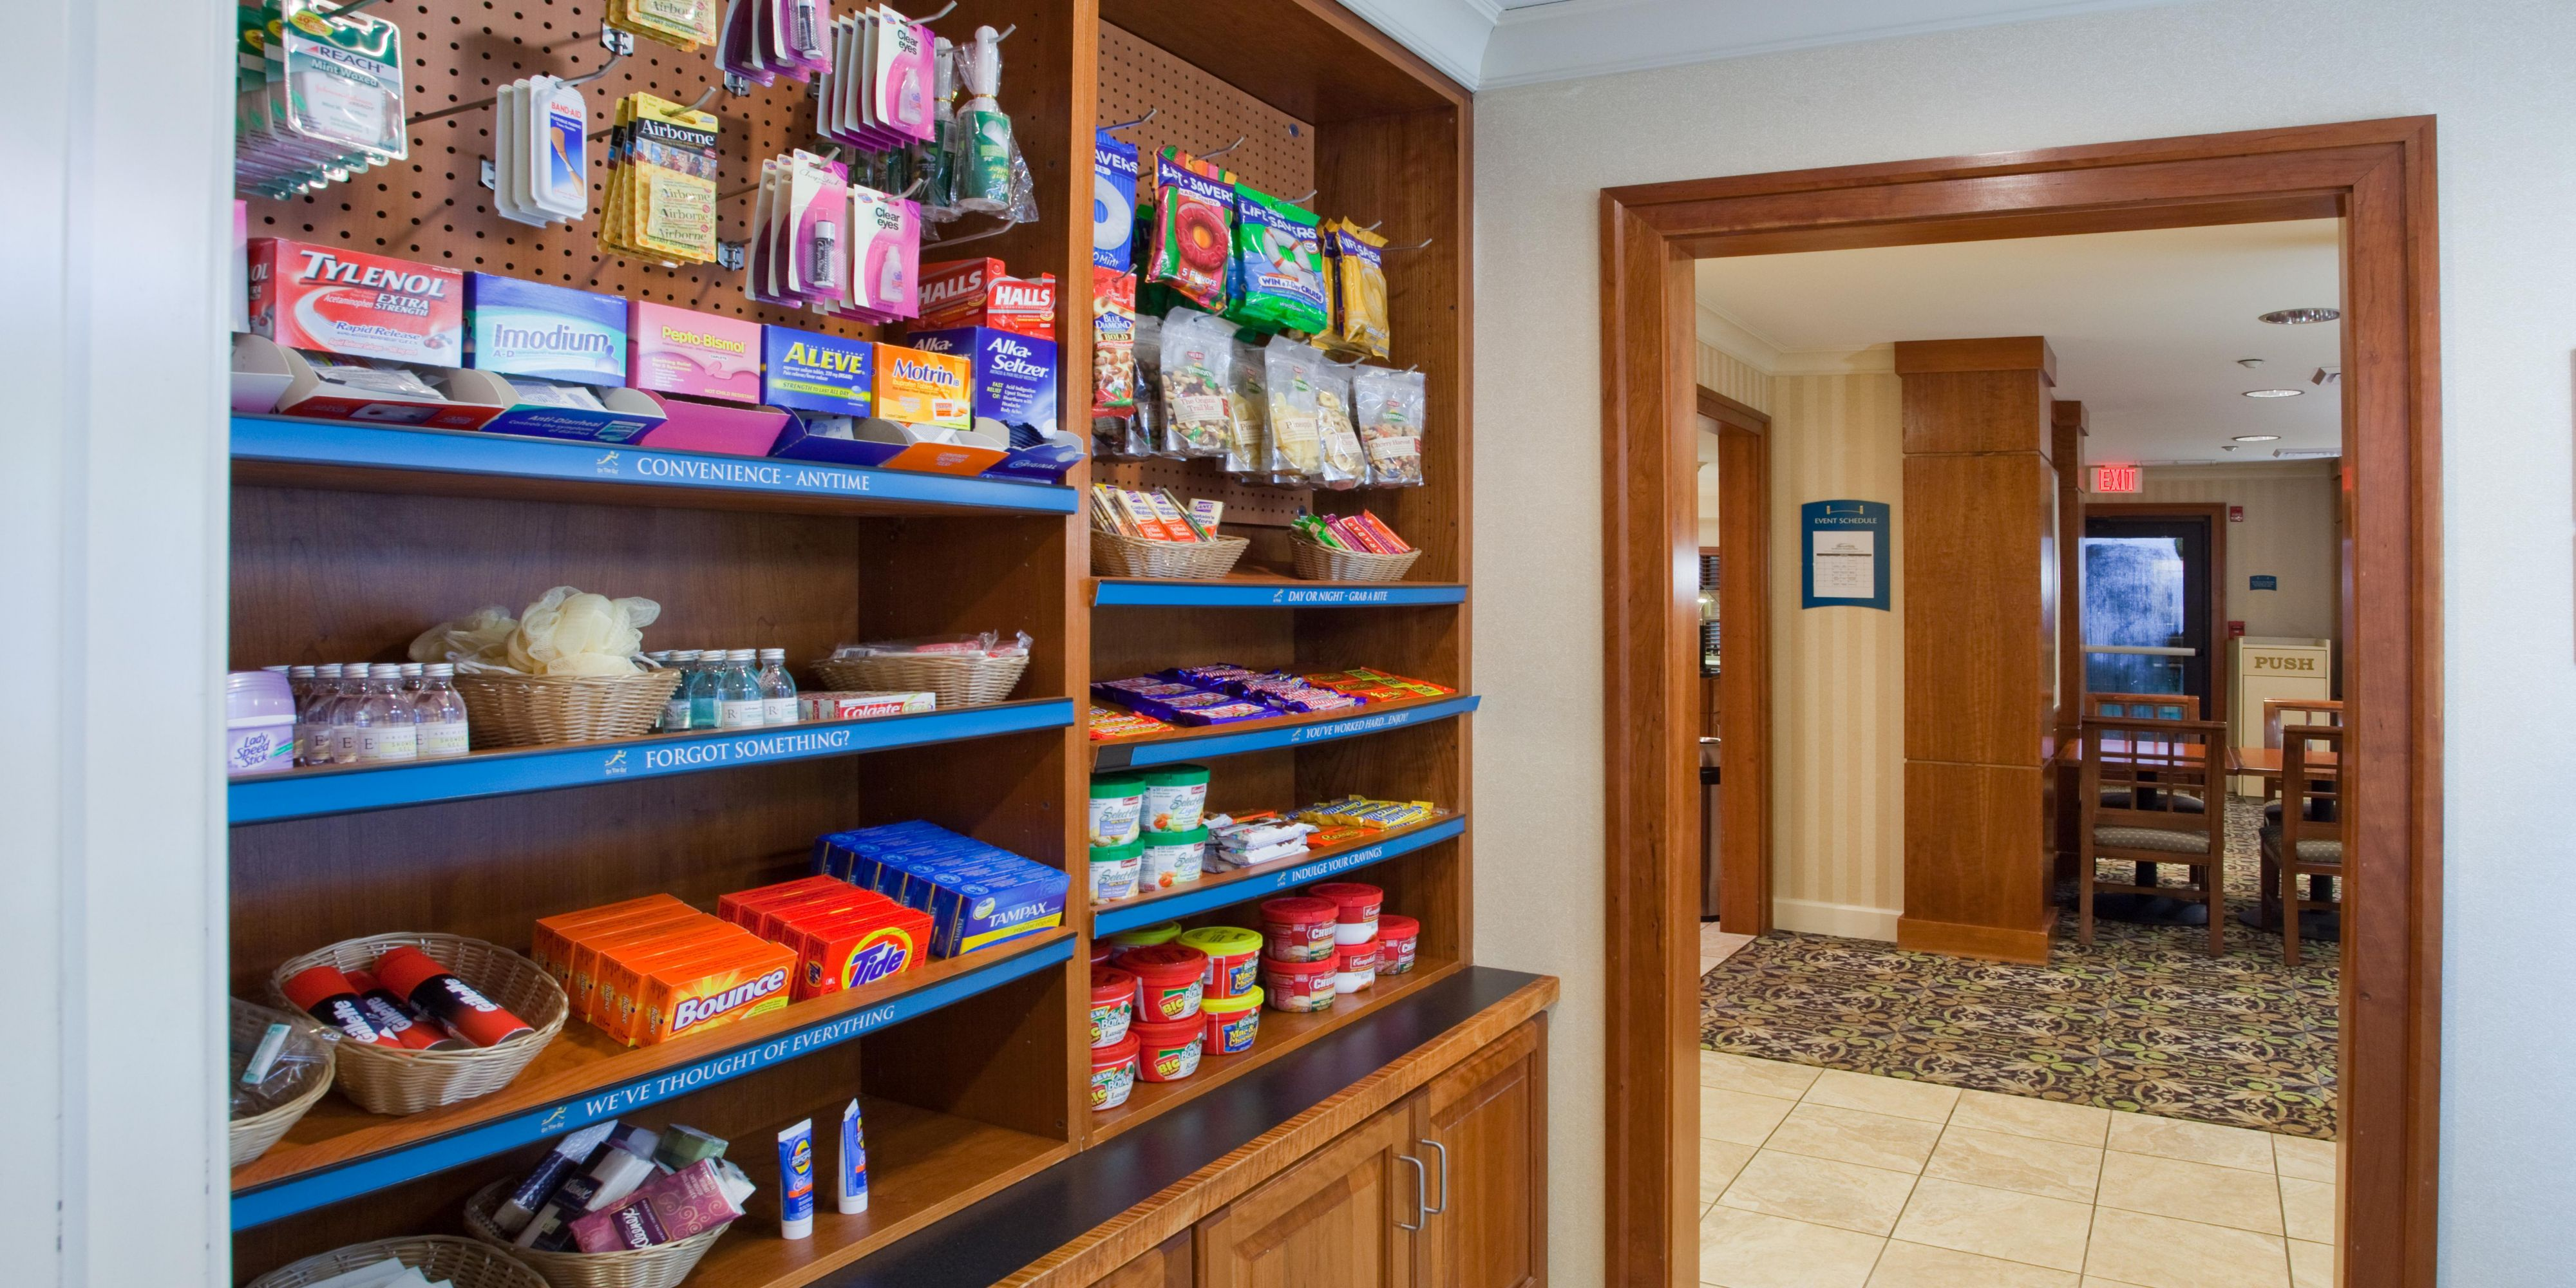 Staybridge Suites Savannah Airport - Pooler image 2